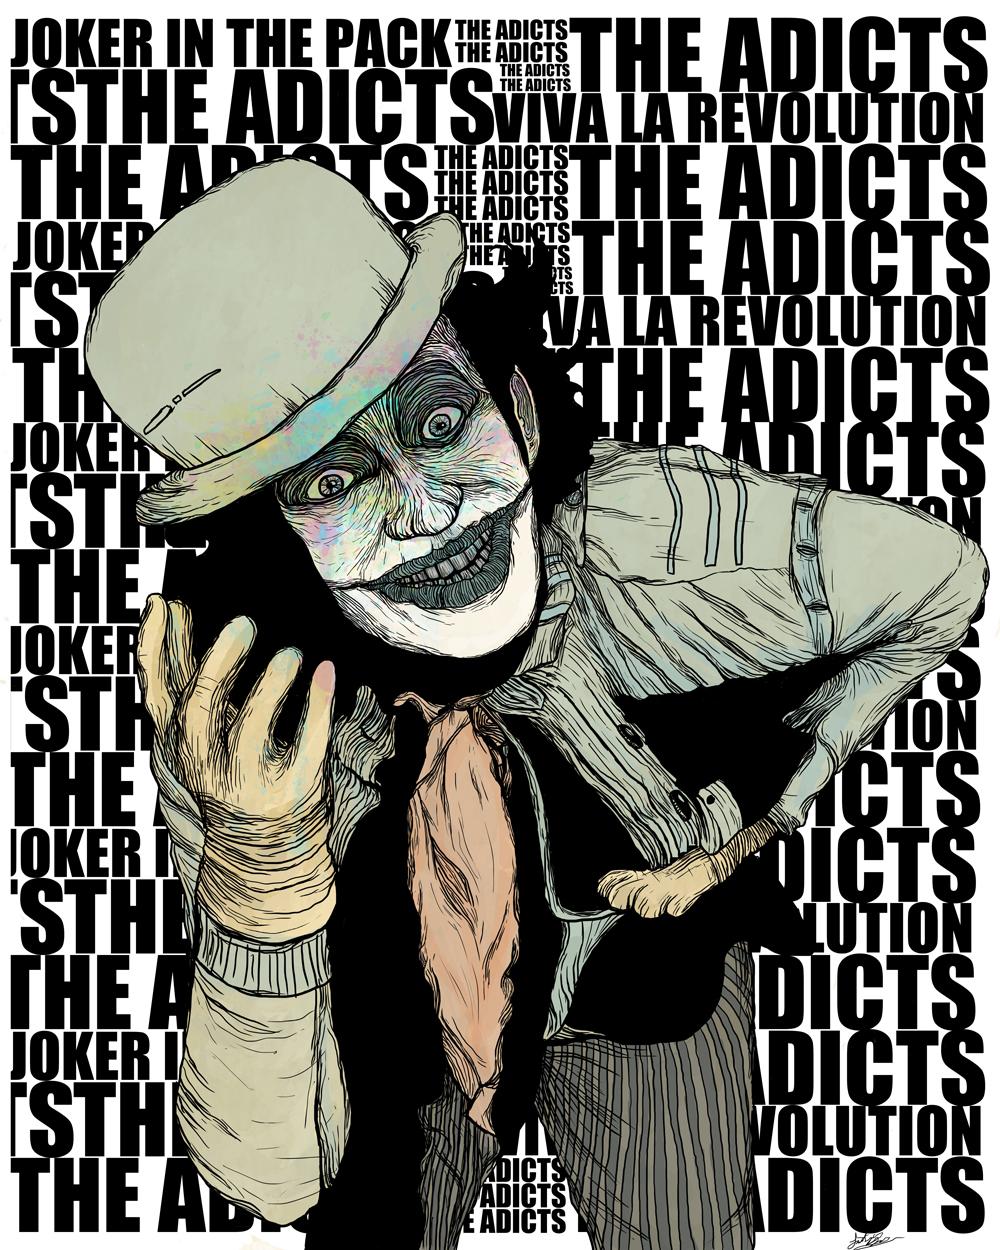 Monkey - The adicts